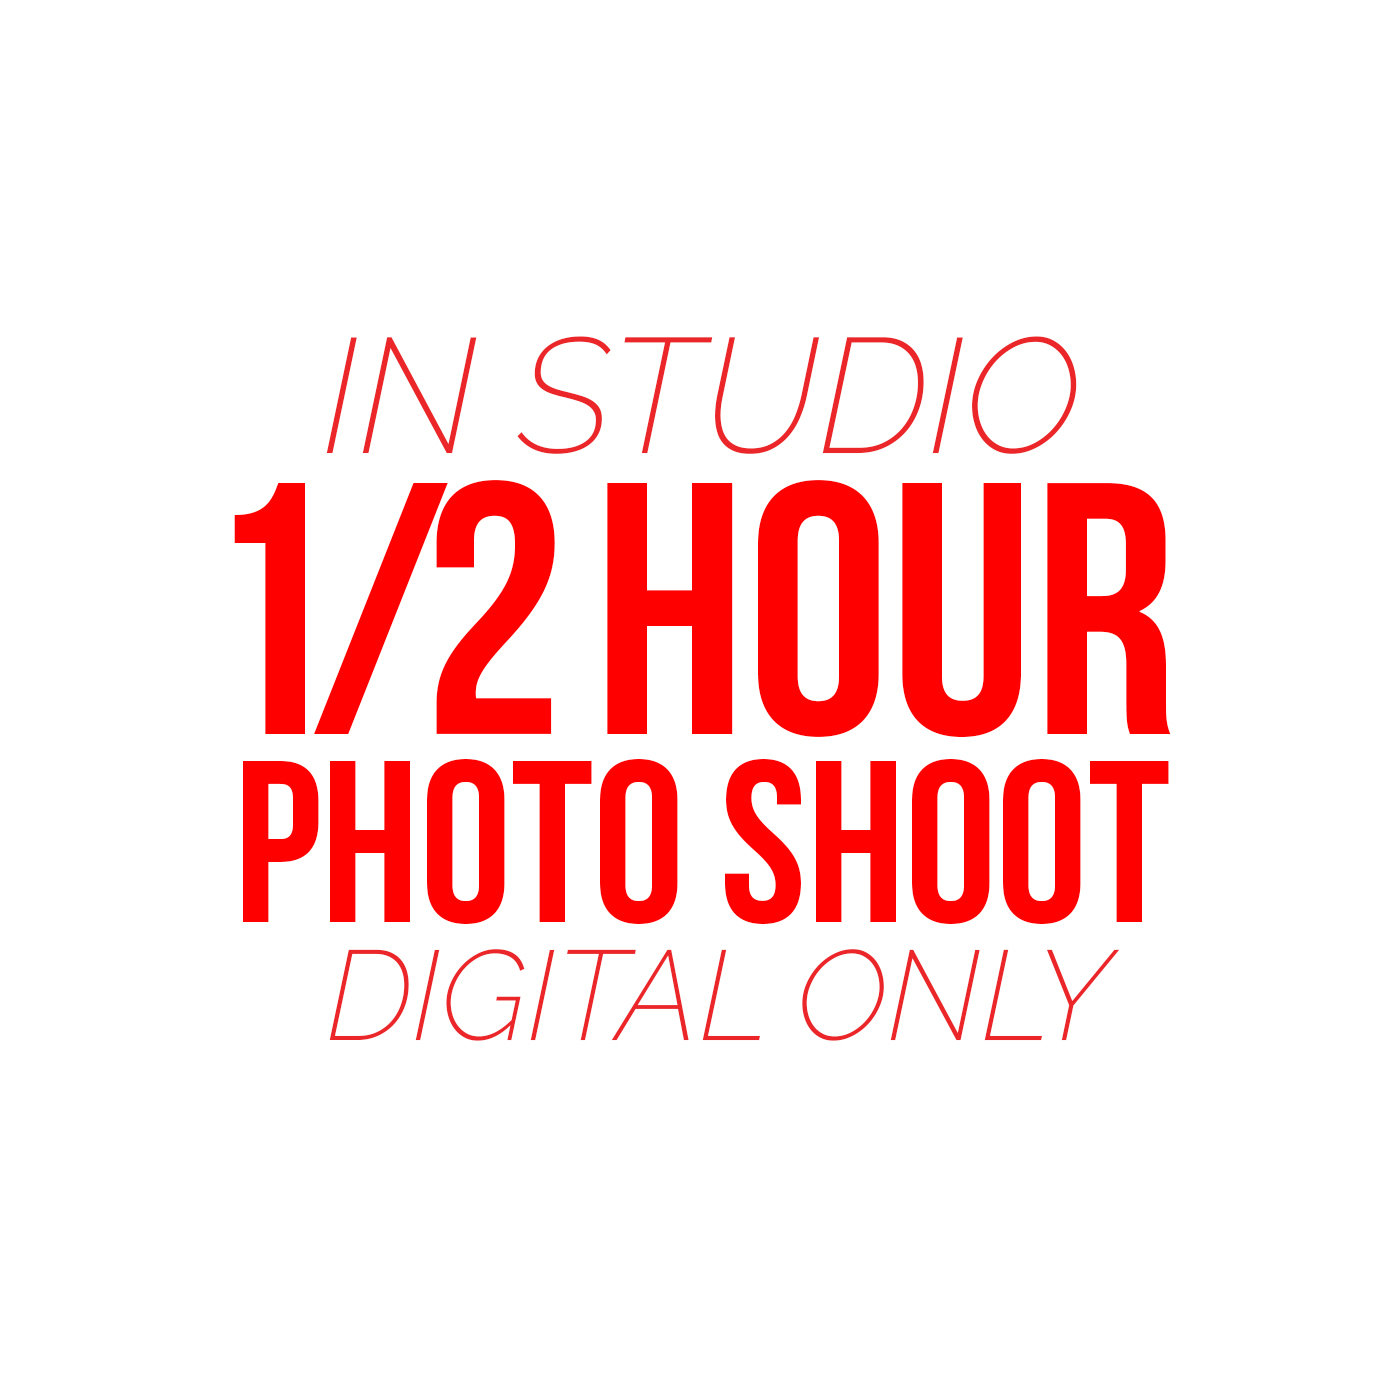 1/2 Hour Photo Shoot